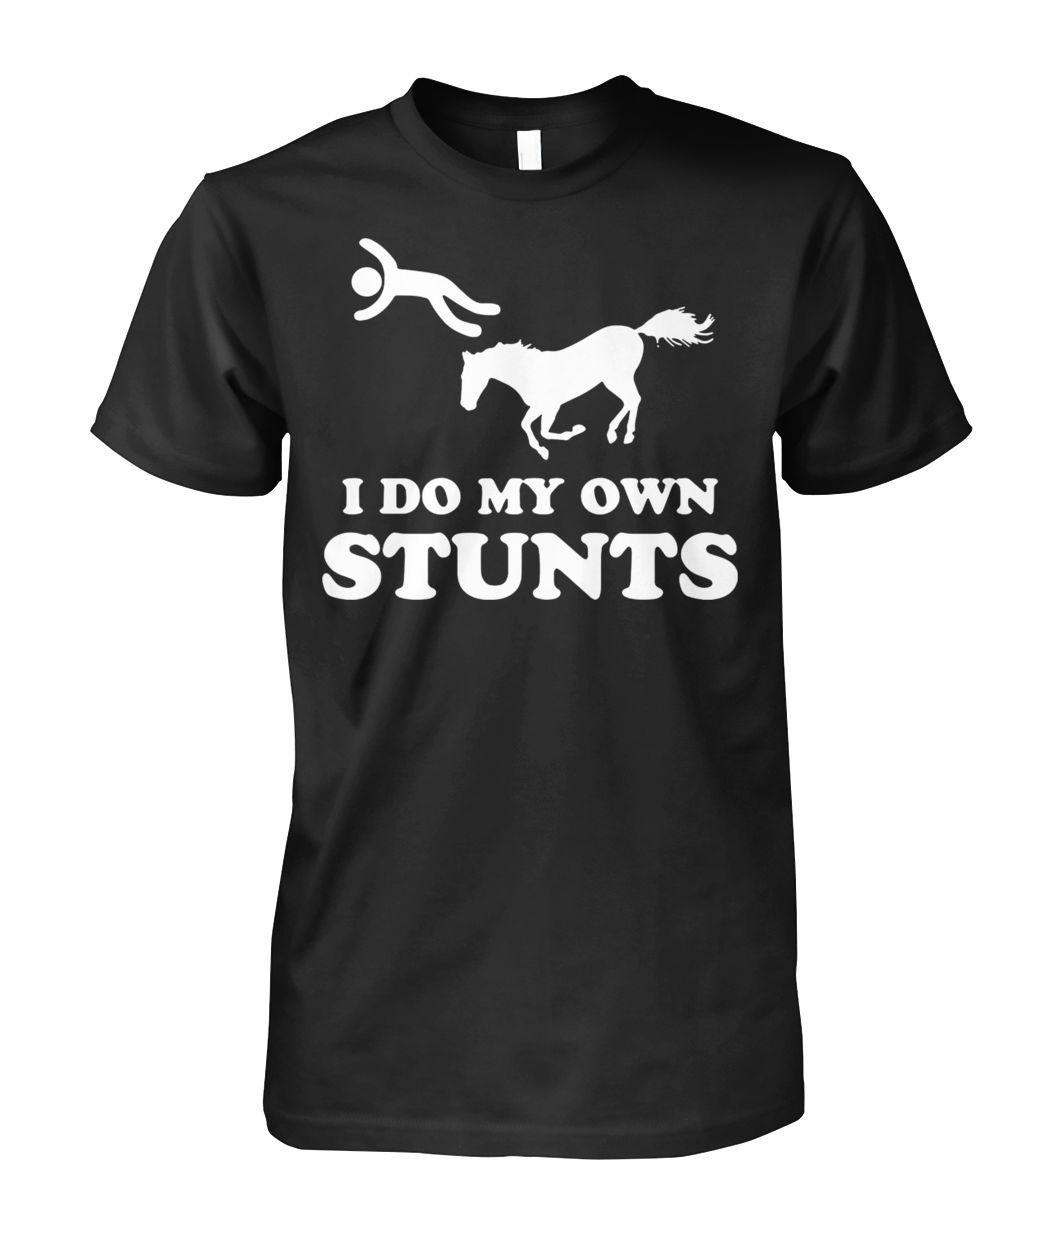 578c825579f79 Unhorse I do my own stunts Tee Shirt | Trending shirt | Shirts, Mens ...